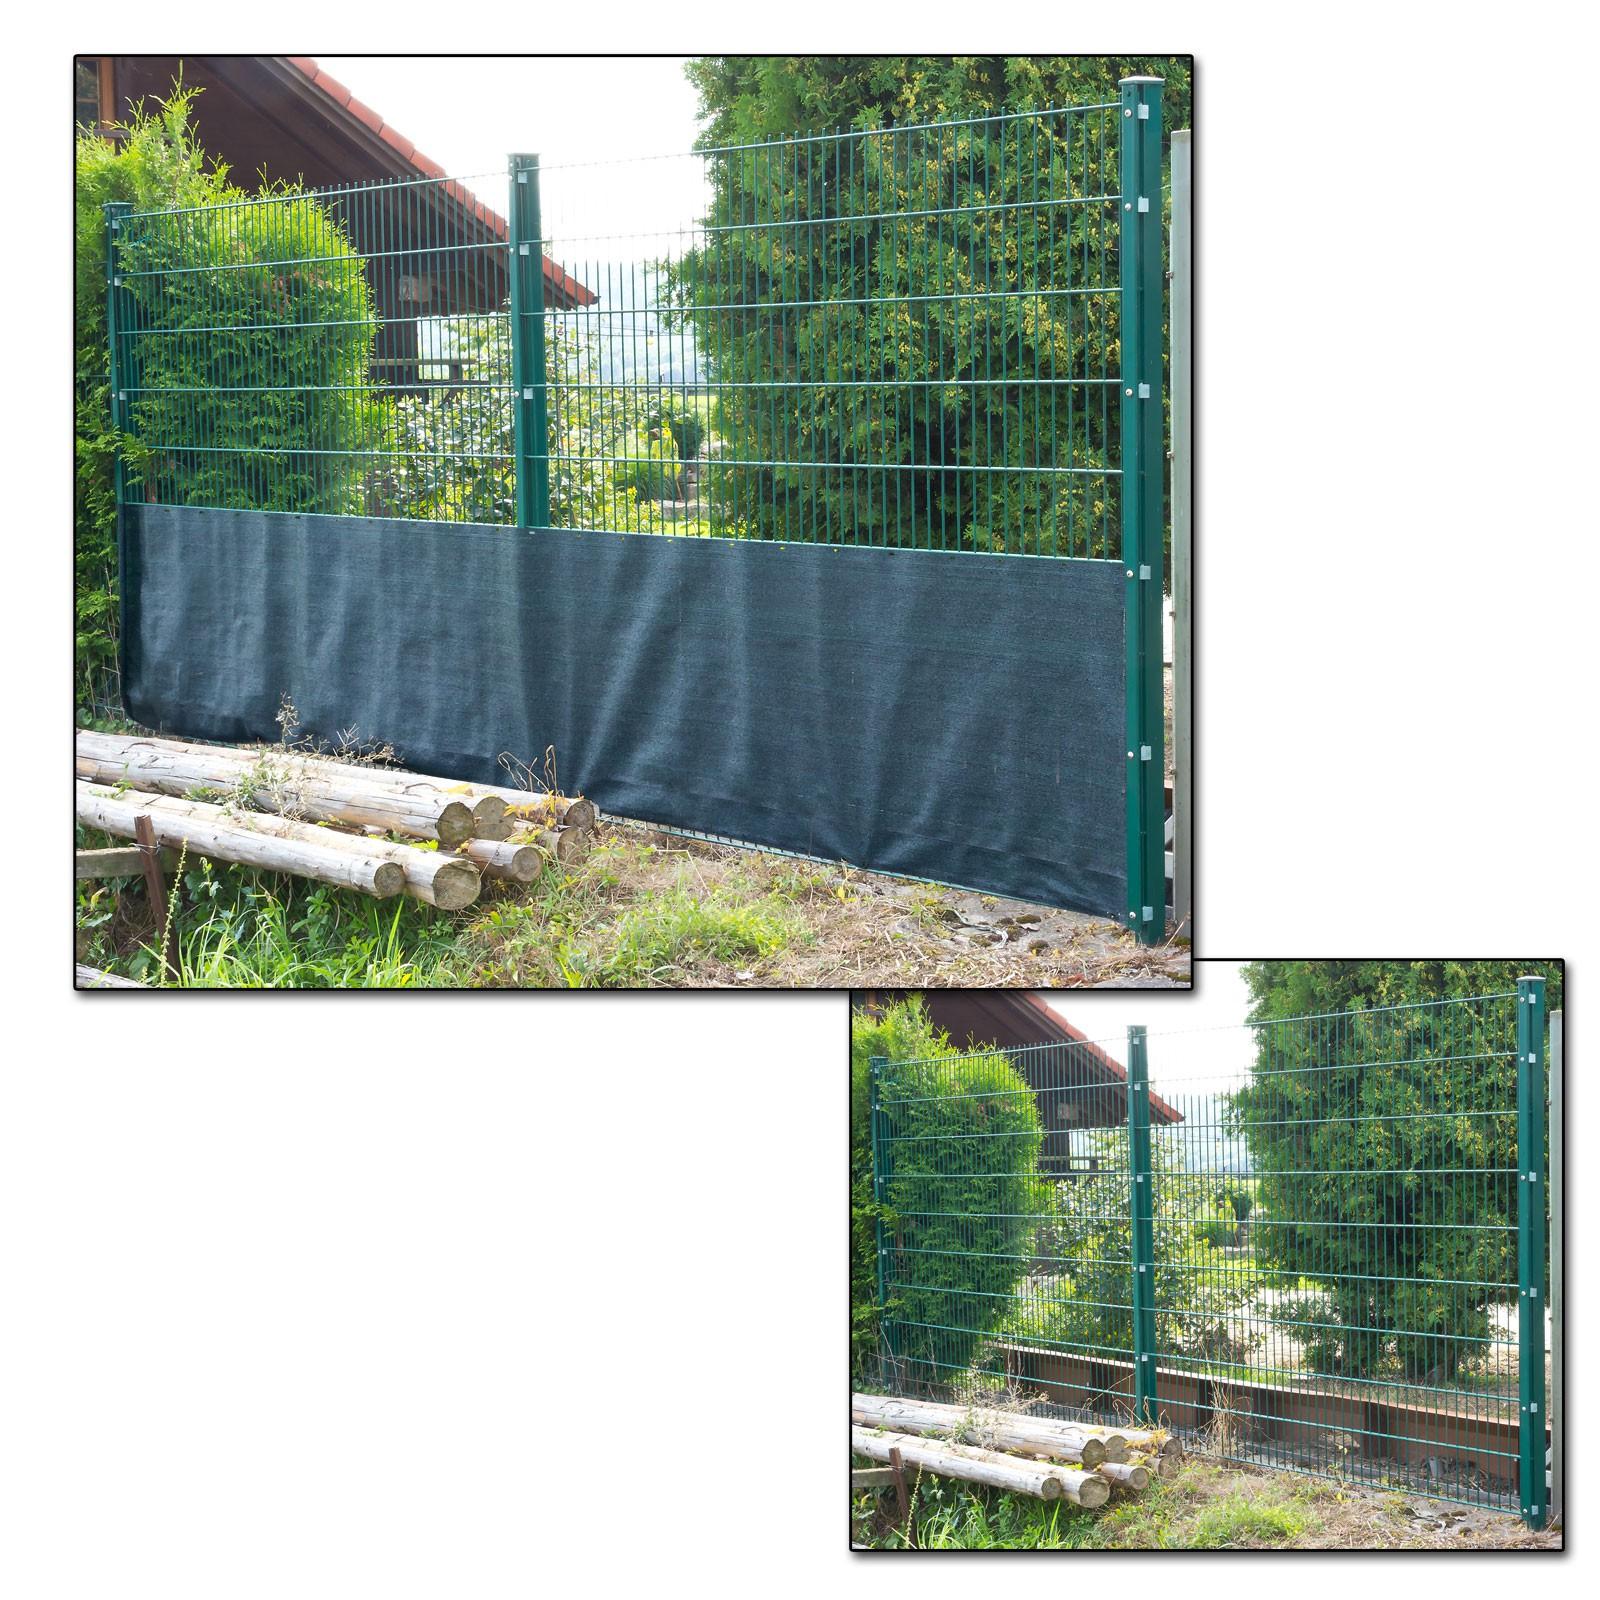 Sichtschutzzaun dunkelgrün 25 x 1 · 1 20 · 1 50 · 1 80 · 2 m